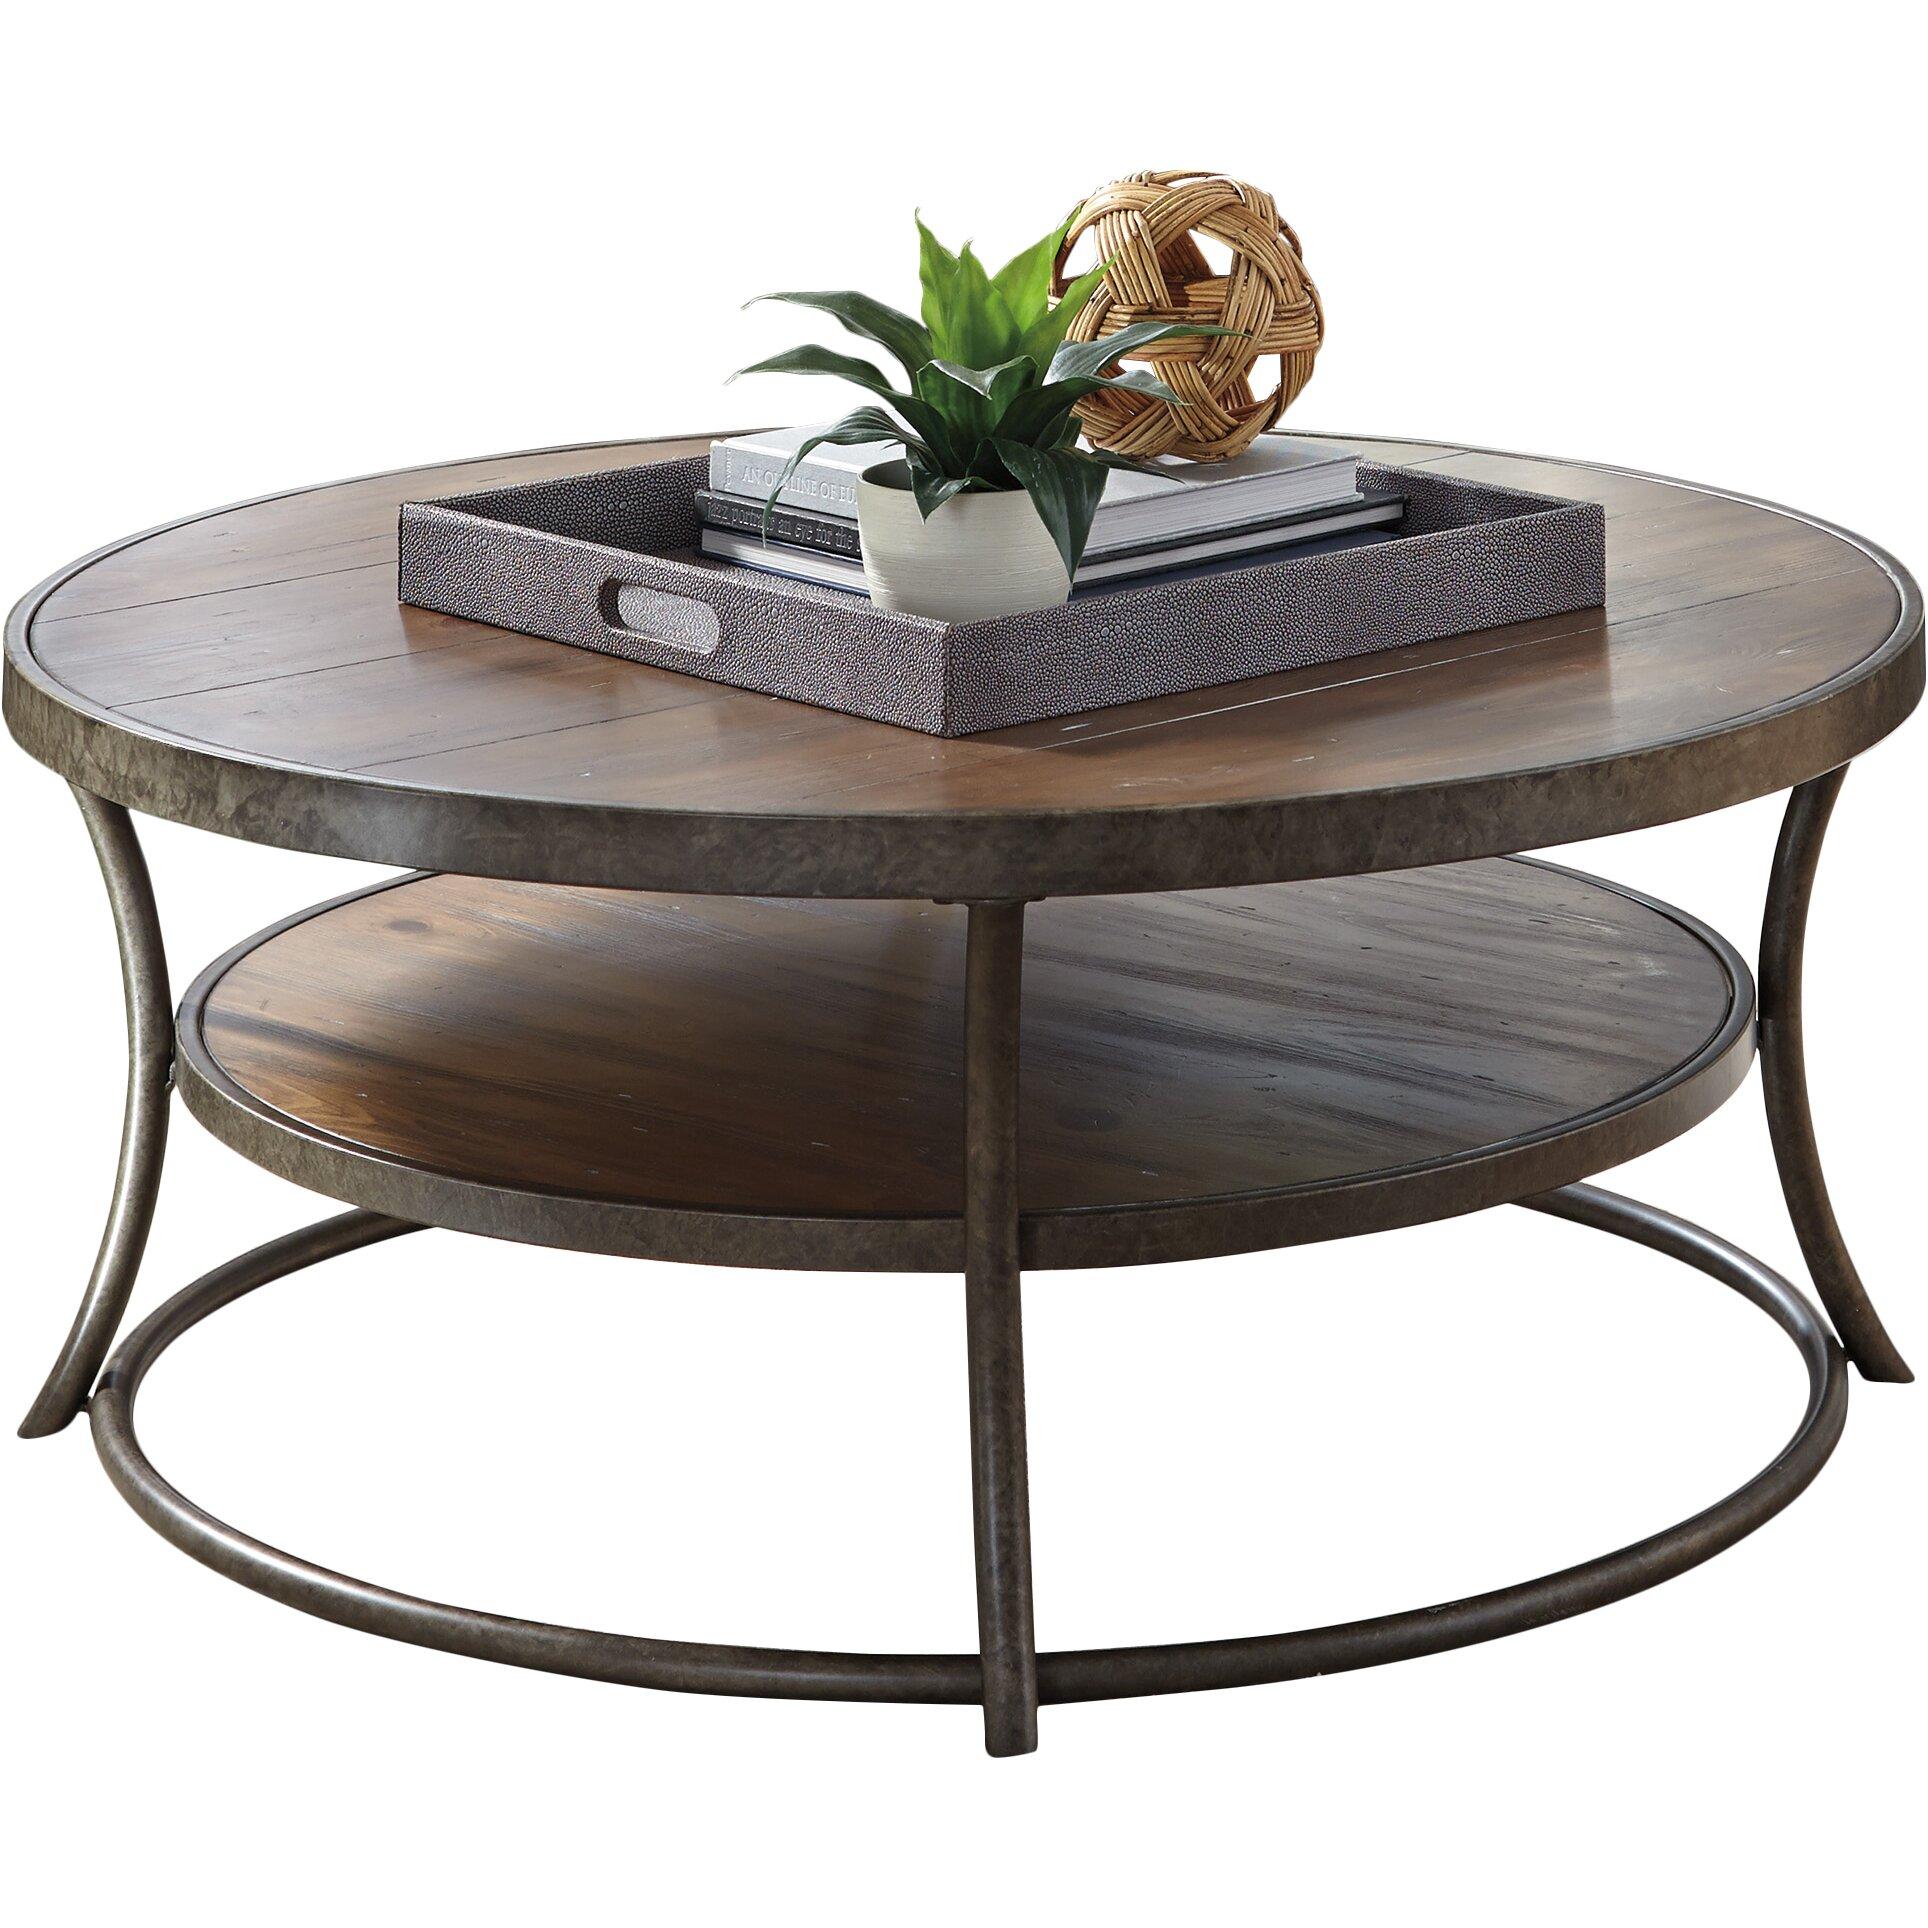 Nailhead Accents Loon Peak Reg Bendeleben Coffee Table